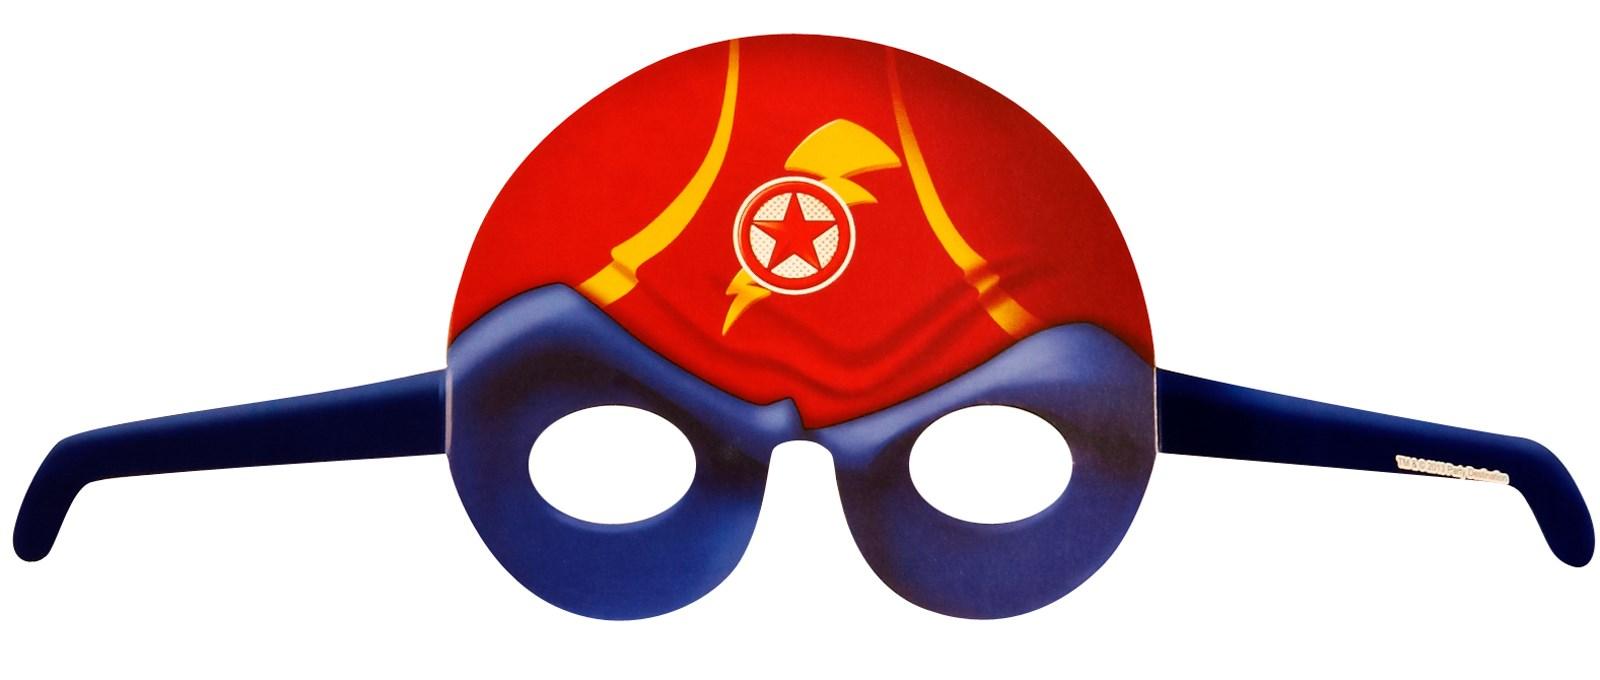 Superhero Comics Mask